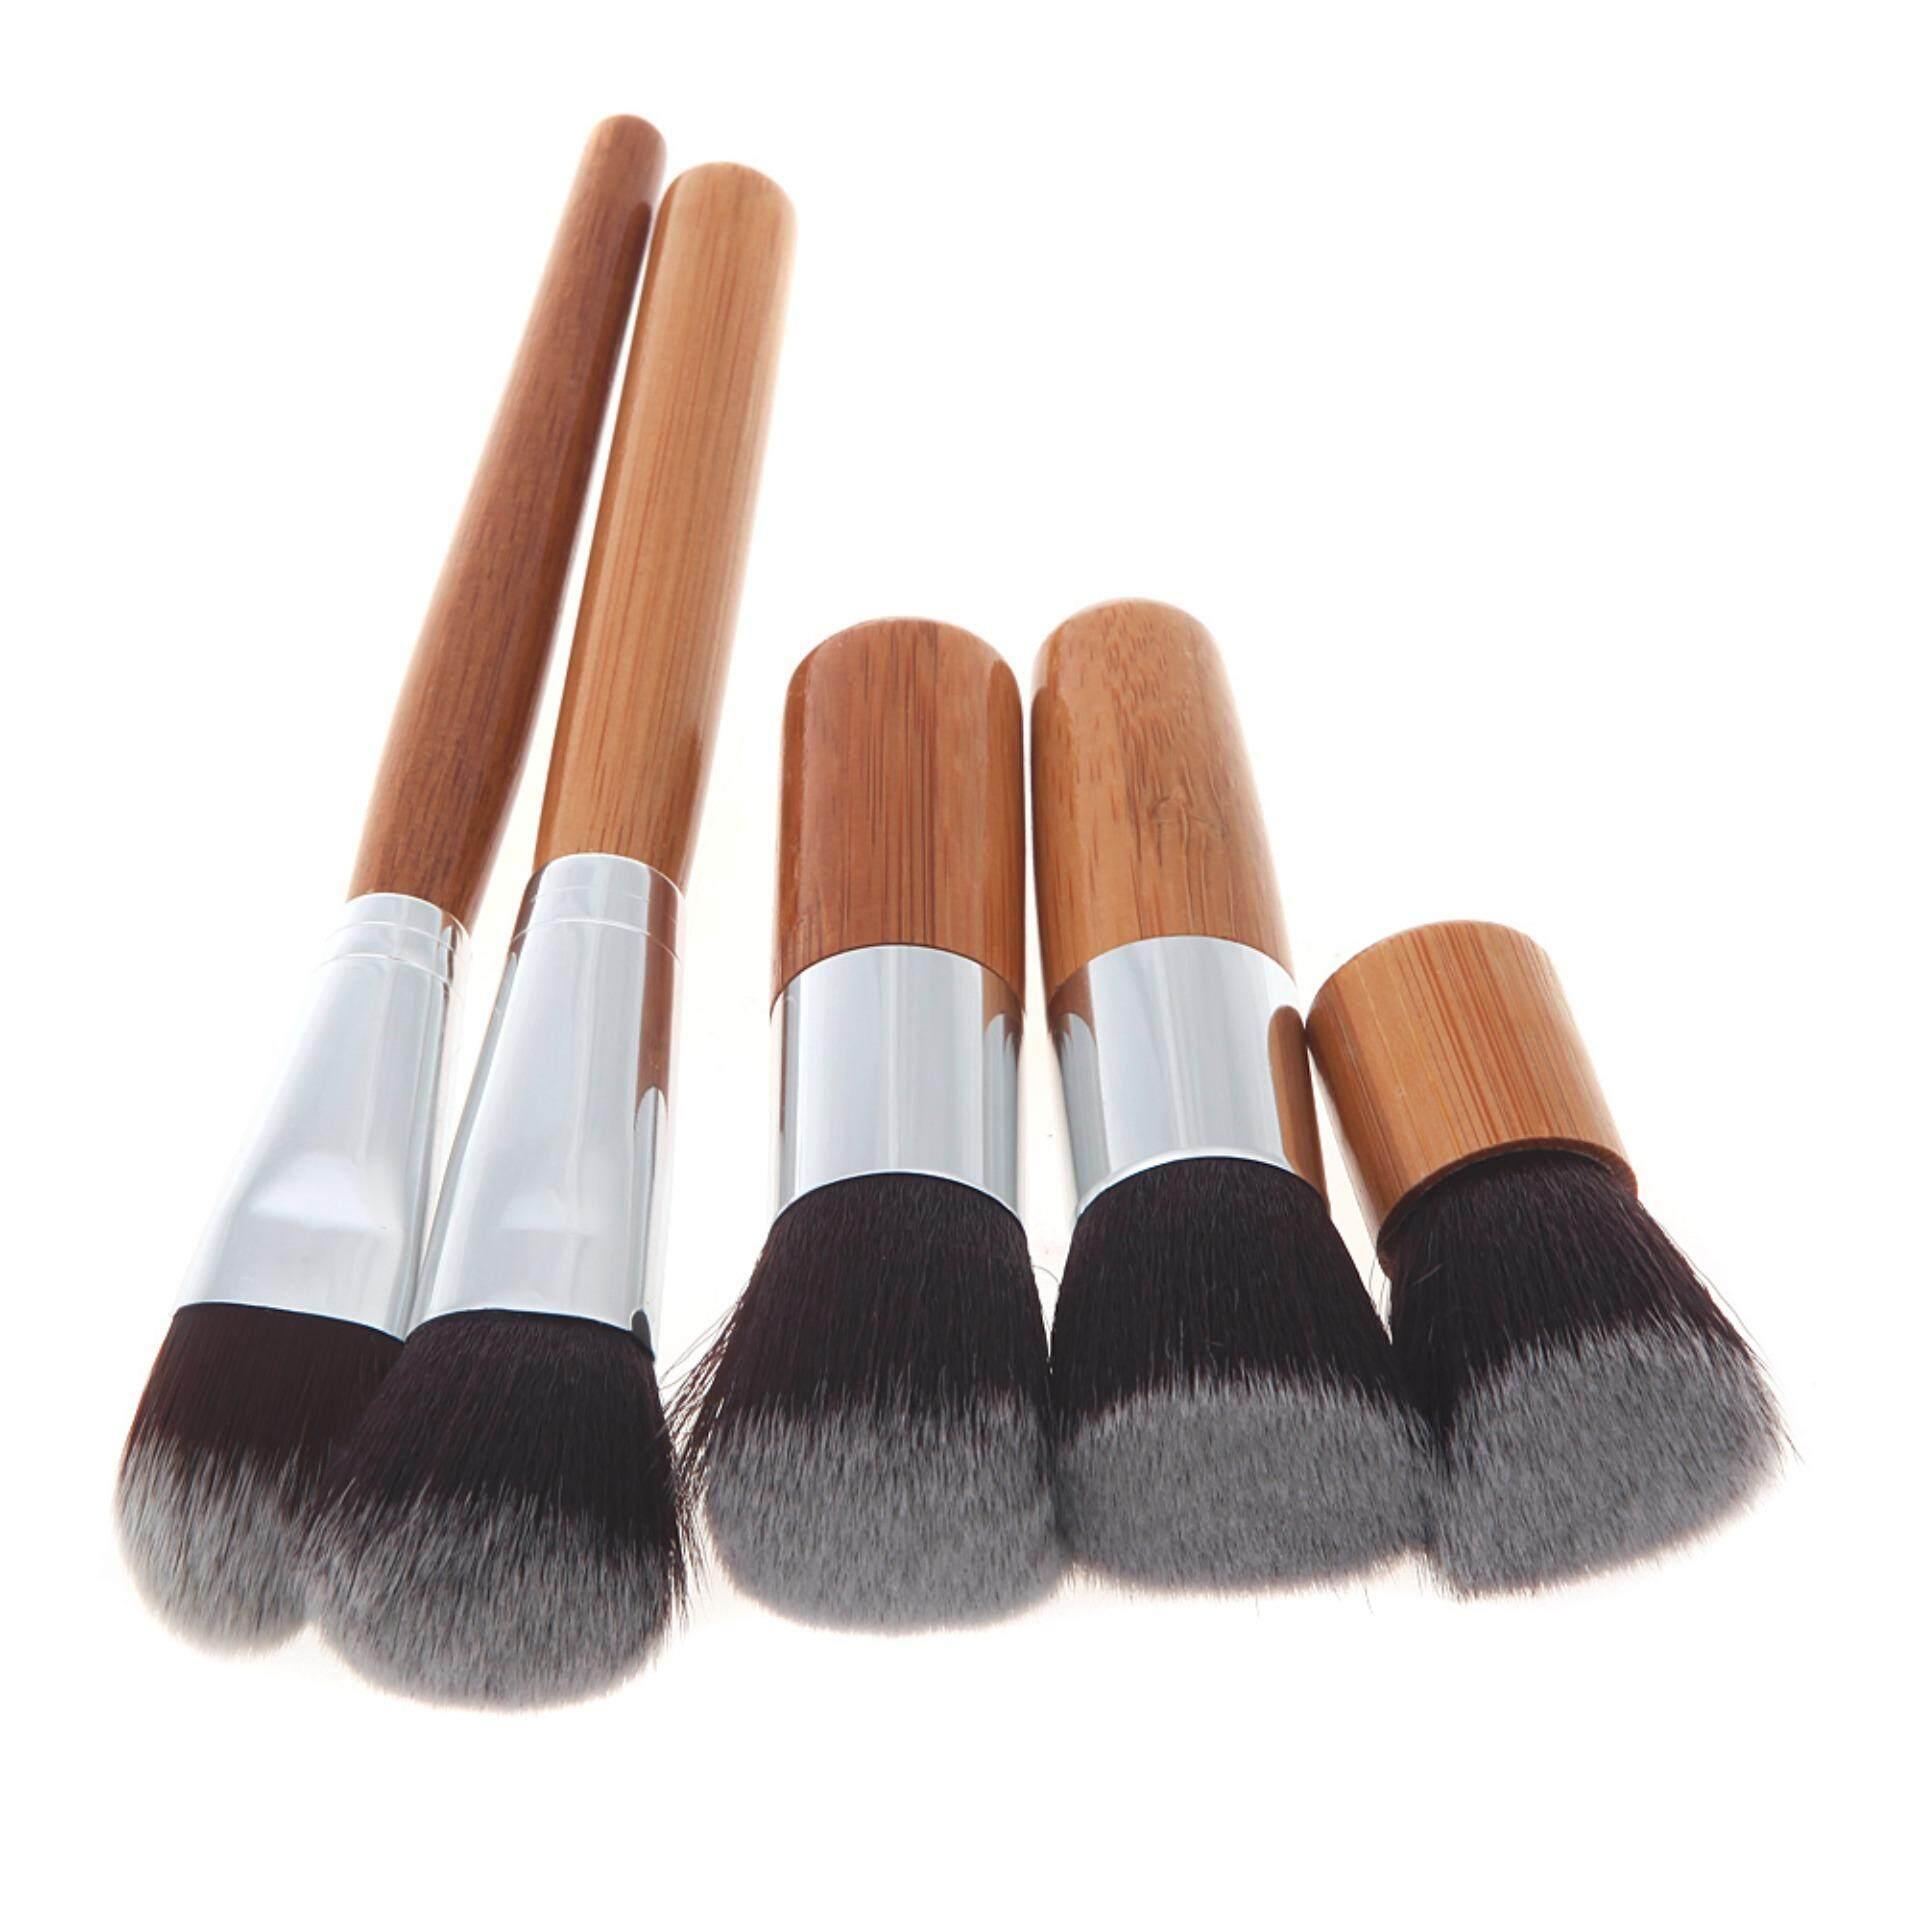 (HALAL BRUSH & FREE BAG) WJS HALAL Cosmetic New 12 Piece makeup make up  Brush Set Bamboo Handle Premium Synthetic Kabuki Foundation Blending Blush